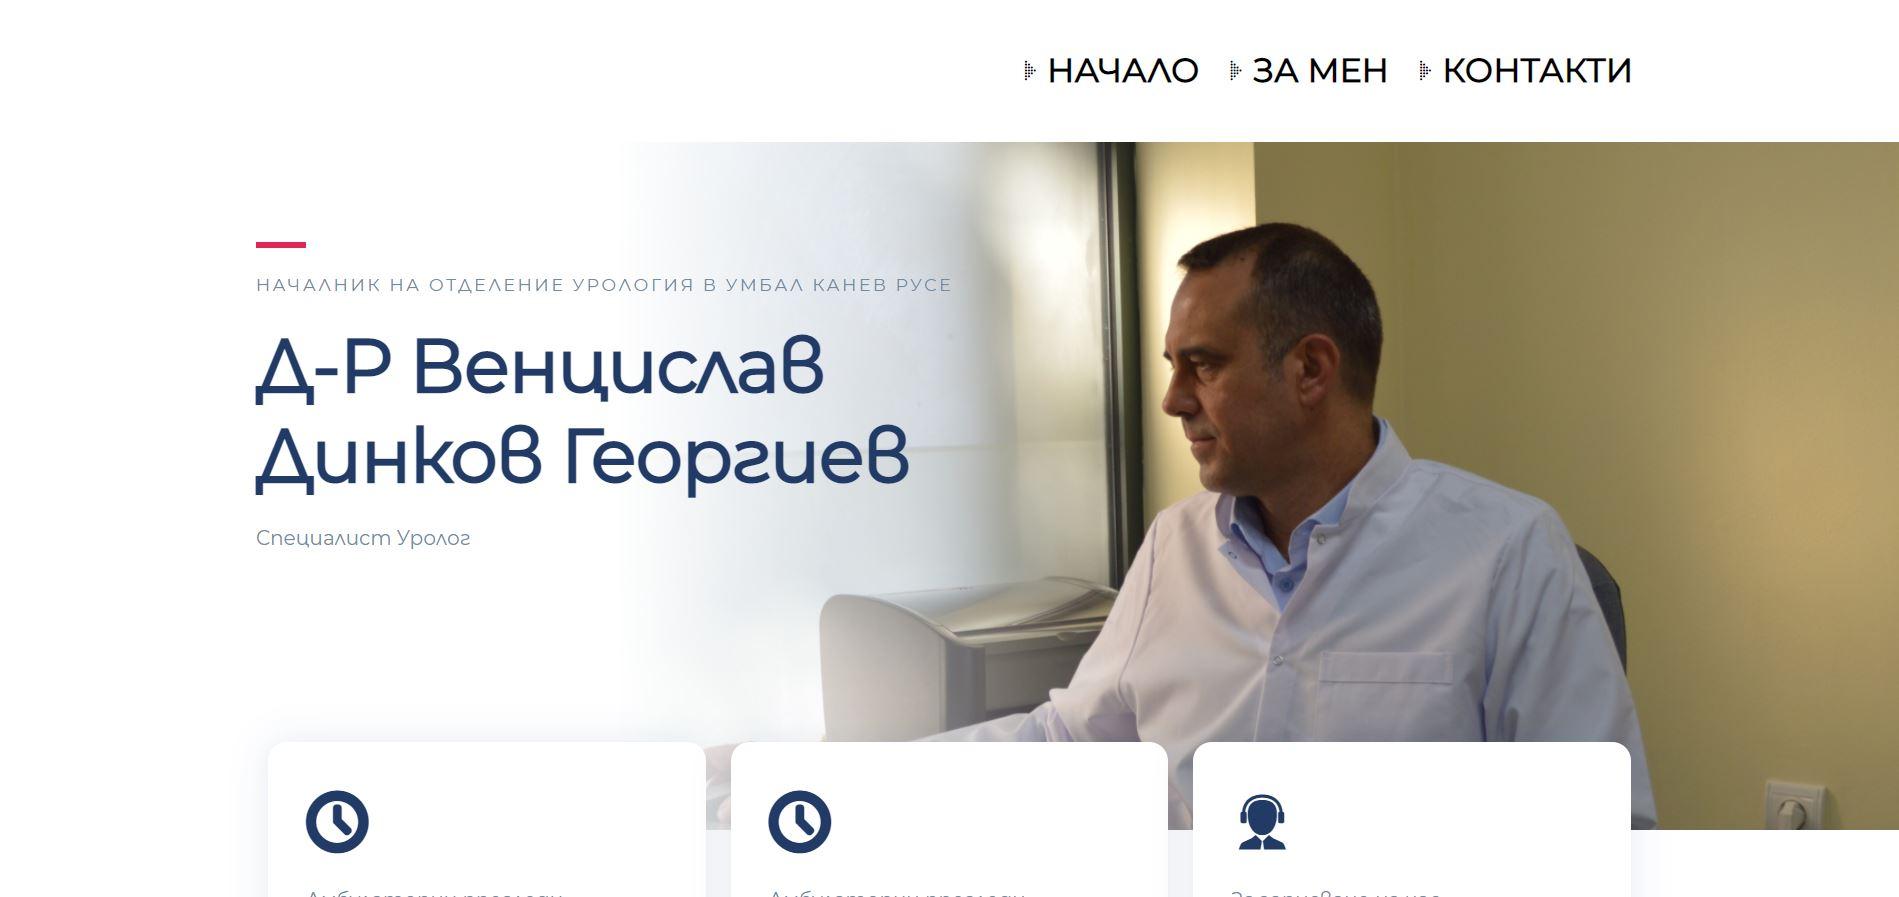 Д-р Венцислав Динков Георгиев специалист Уролог